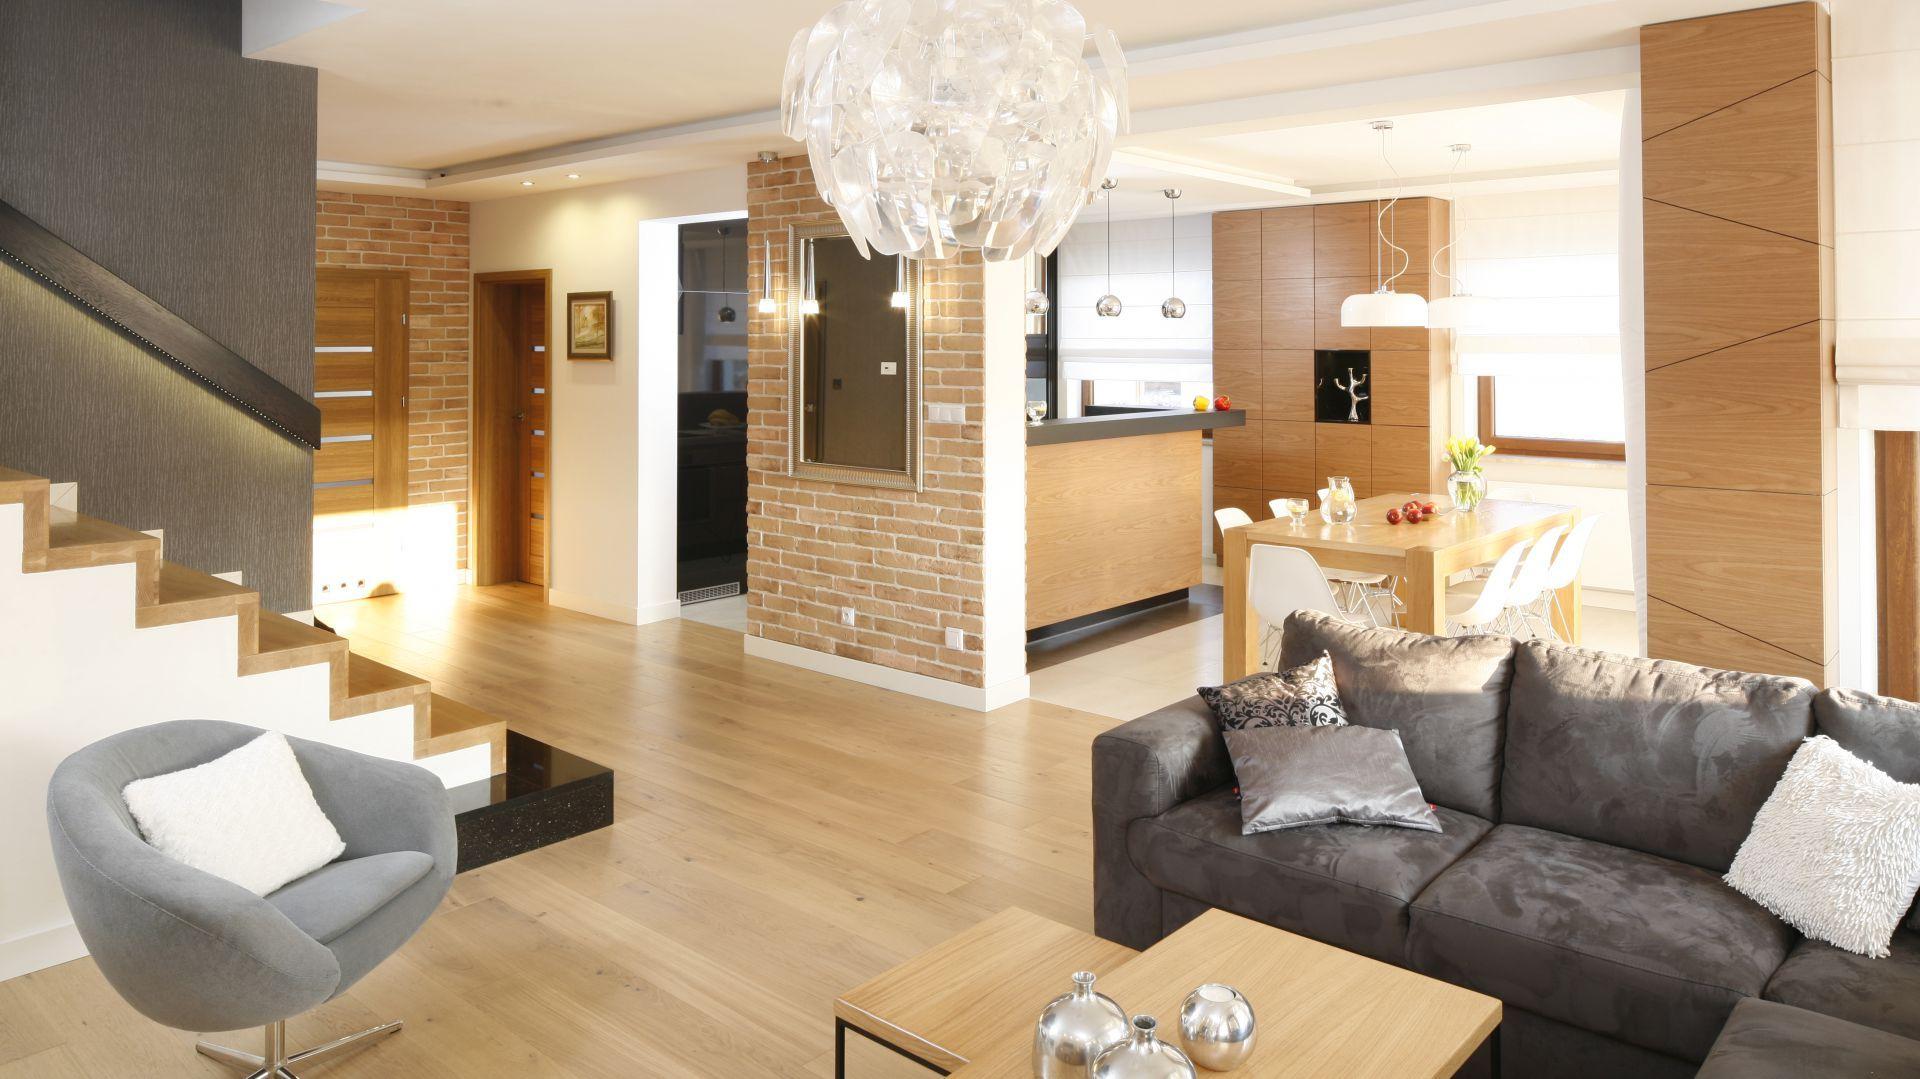 12 Dobrych Pomyslow Na Przedpokoj Interior Design House Interior Home